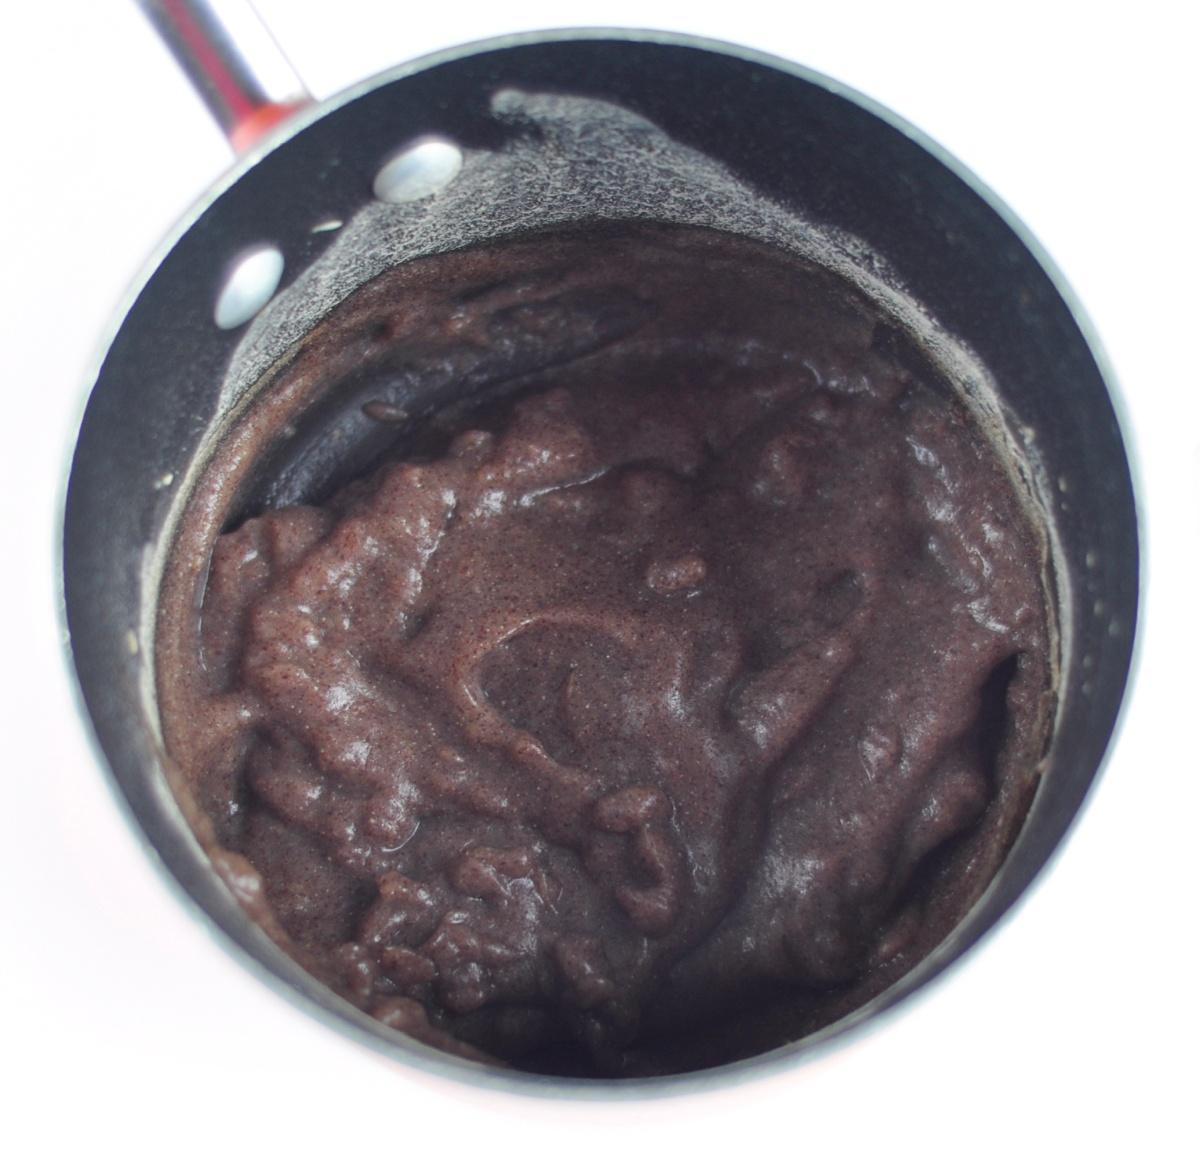 preparation of ragi malt